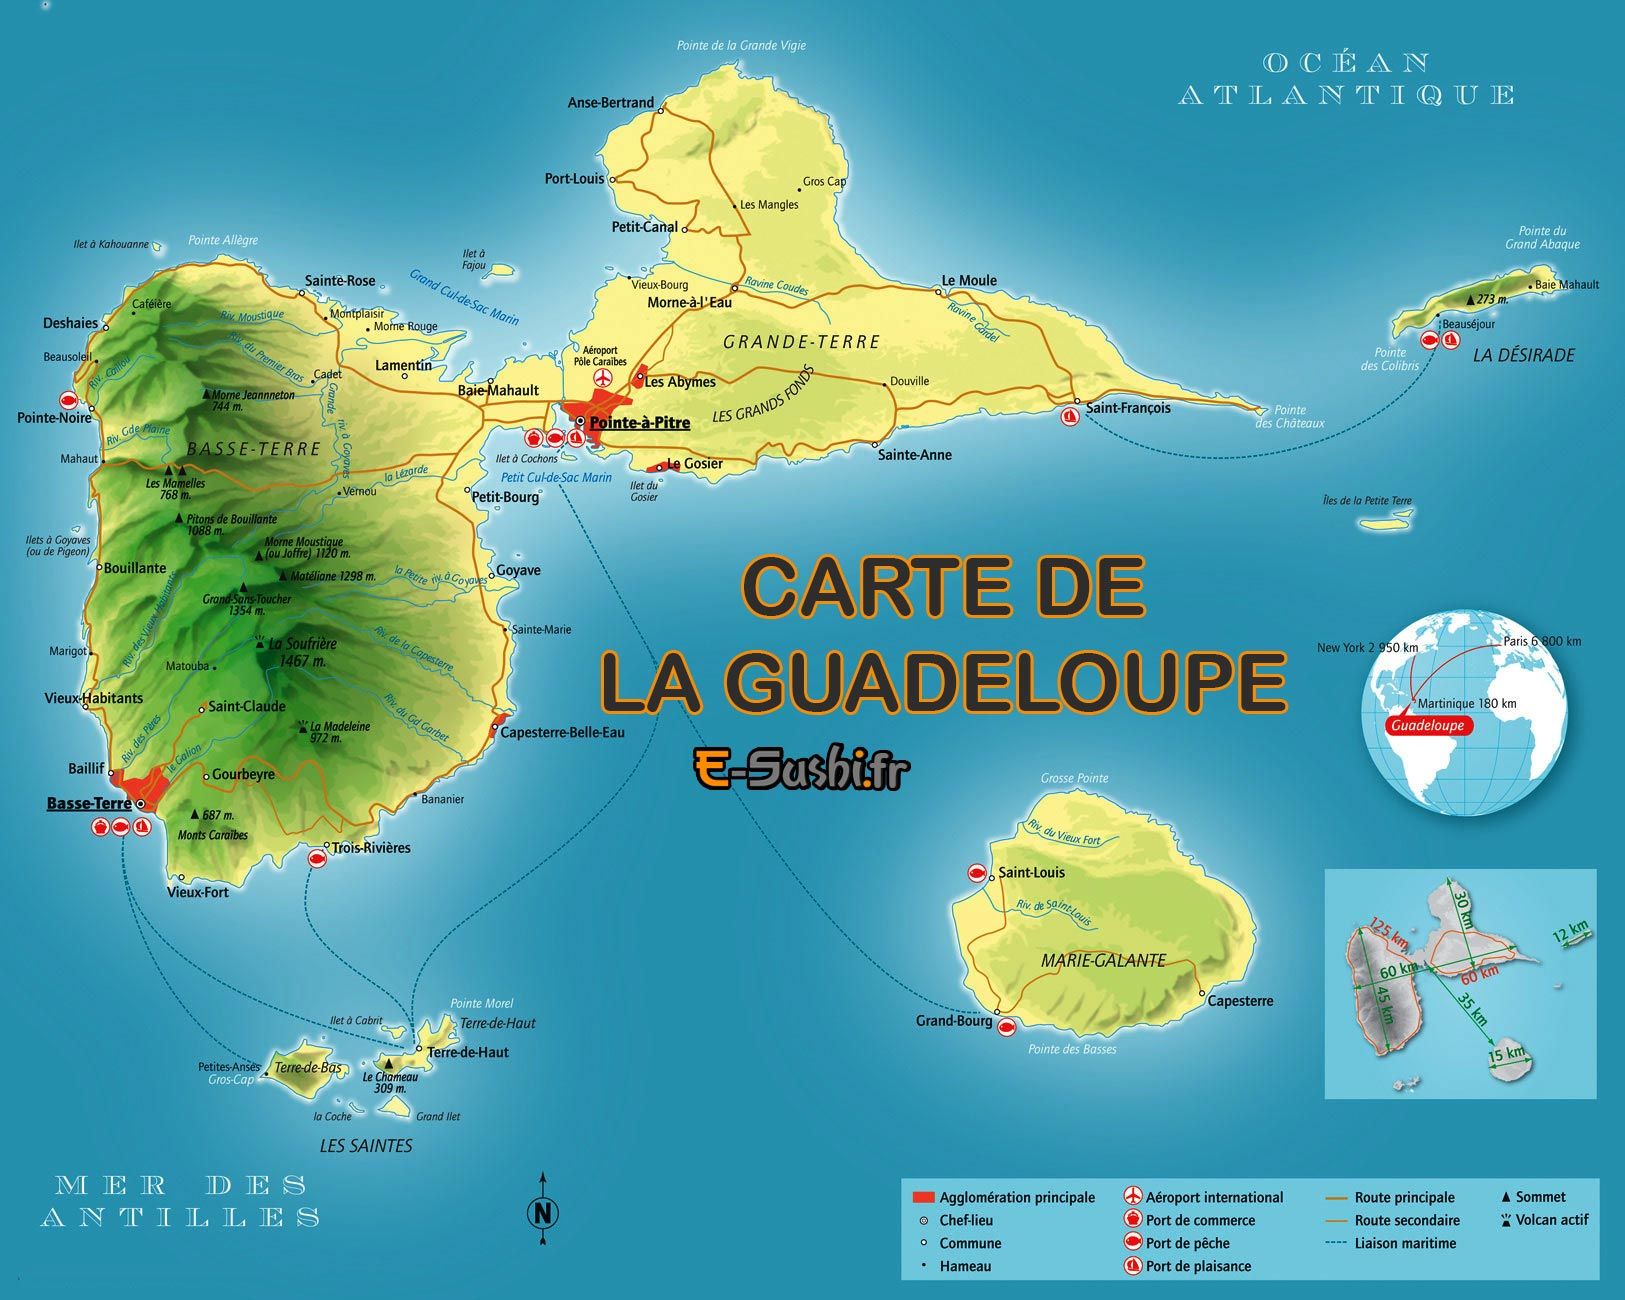 Guadeloupe - Grande carte détaillée